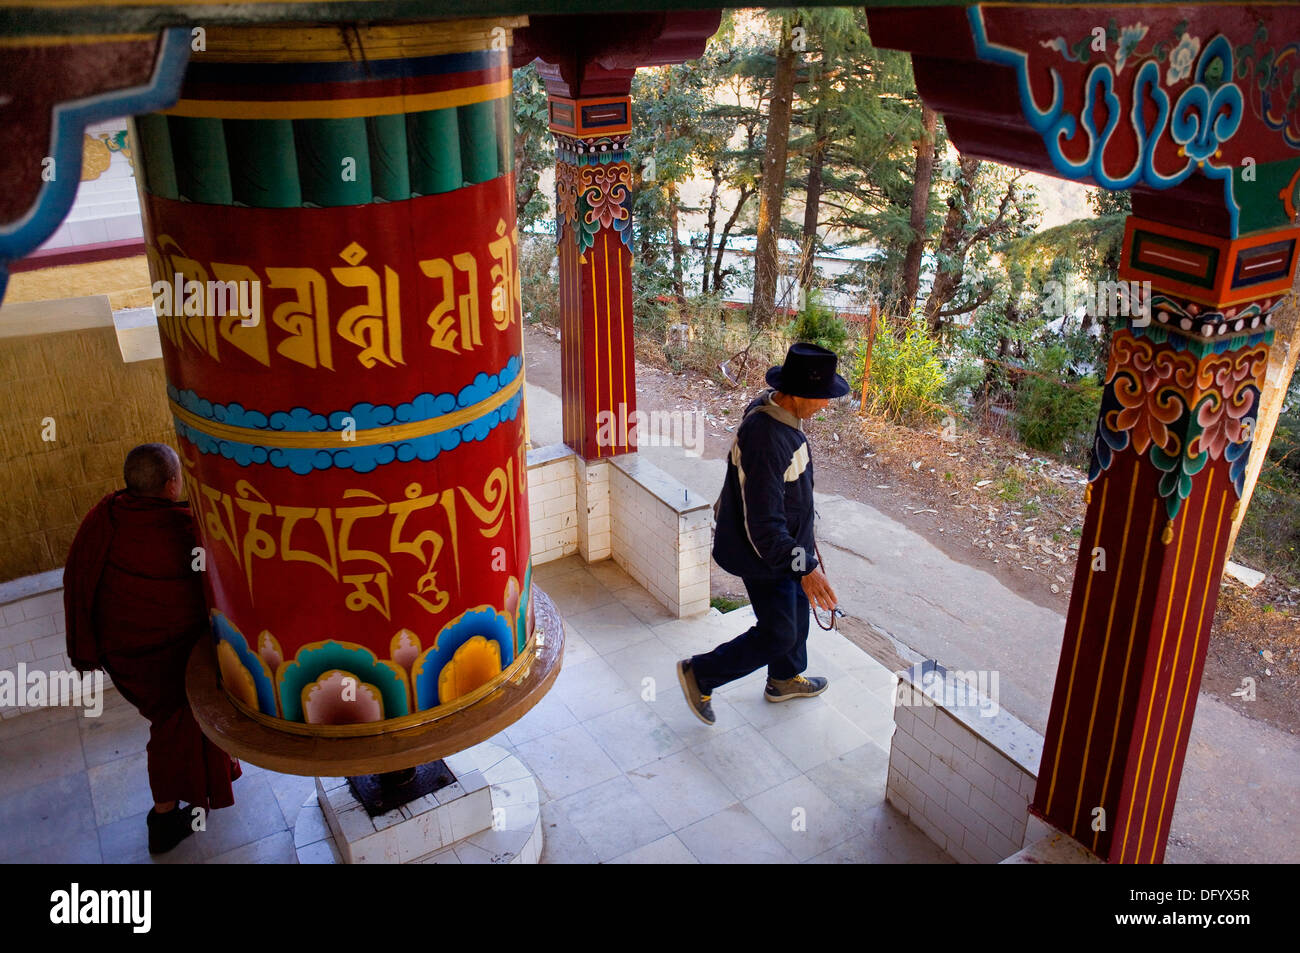 prayer wheel in Lhagyal Ri,near Tsuglagkhang complex,McLeod Ganj, Dharamsala, Himachal Pradesh state, India, Asia - Stock Image